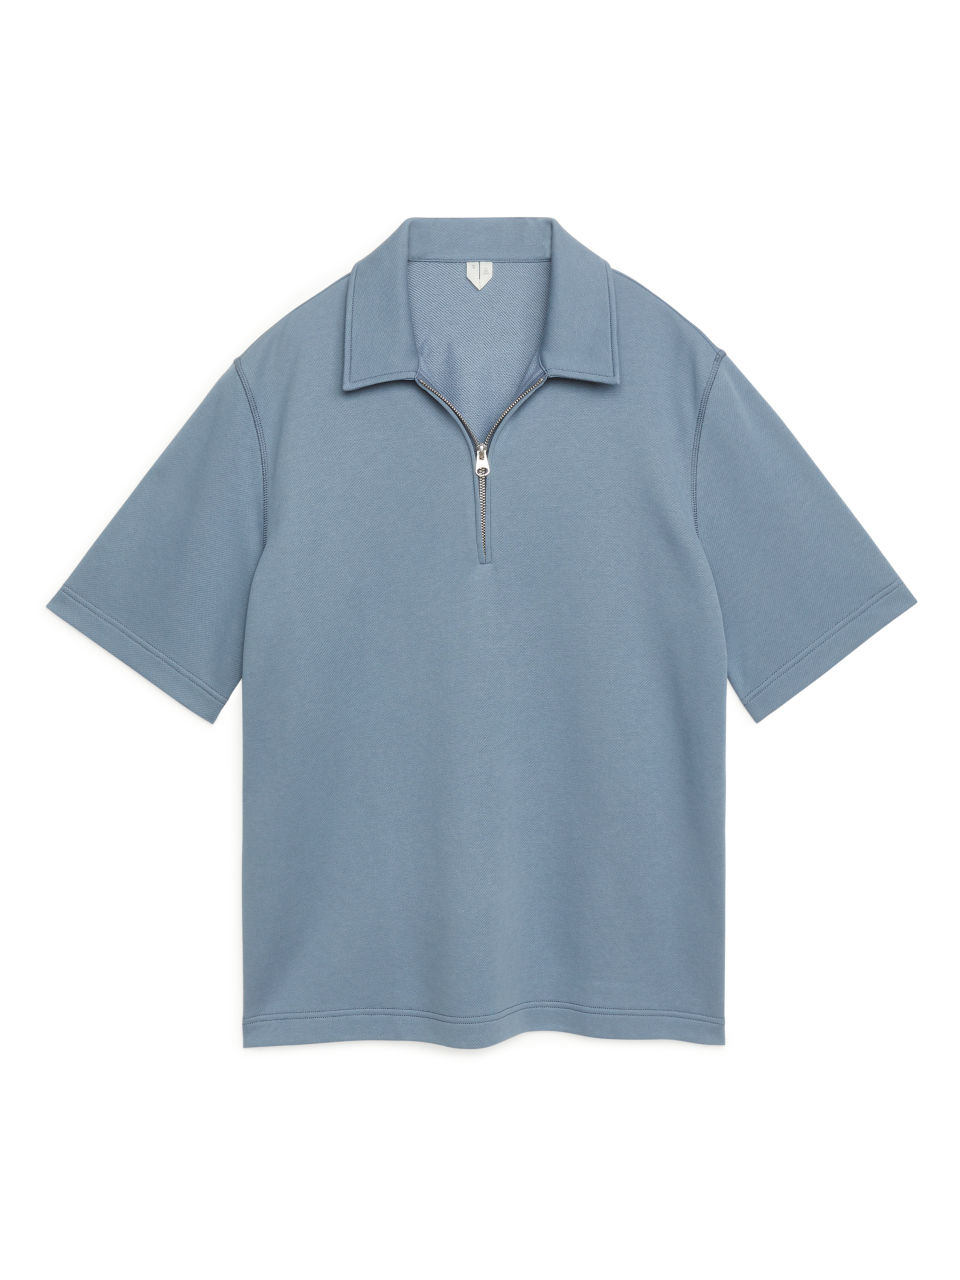 Zipped Polo Shirt - Blue